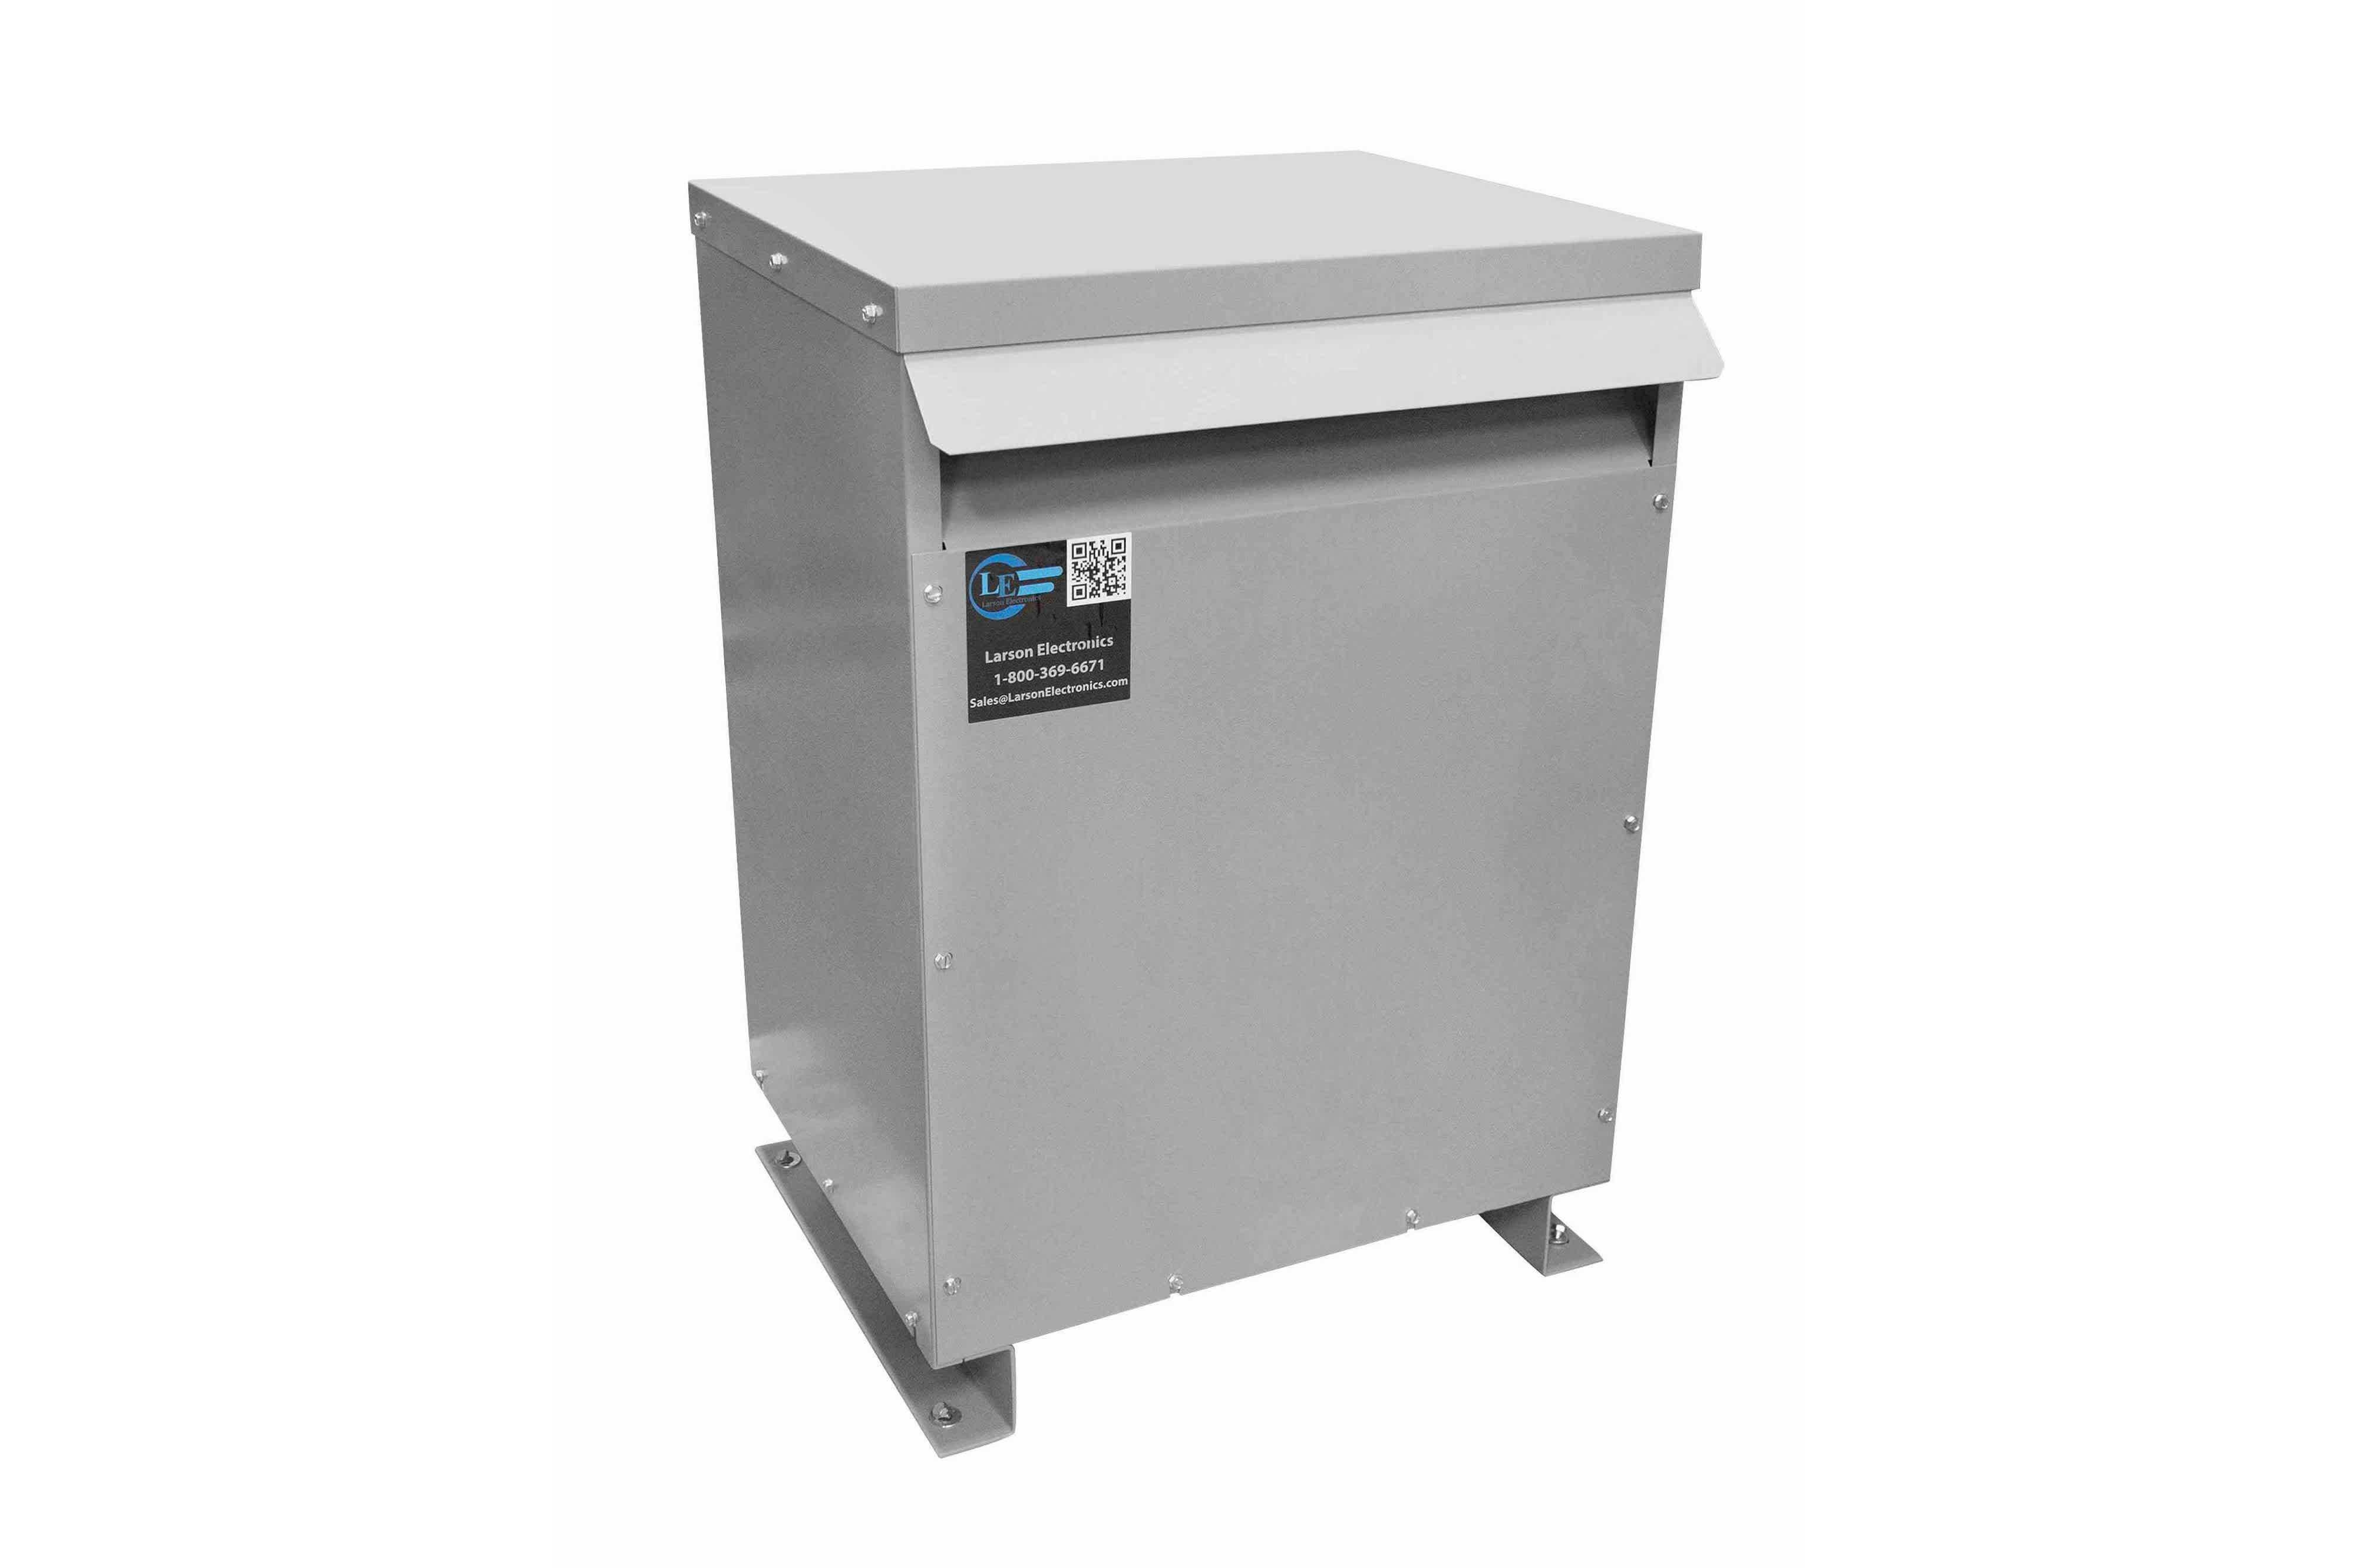 125 kVA 3PH Isolation Transformer, 575V Wye Primary, 415V Delta Secondary, N3R, Ventilated, 60 Hz